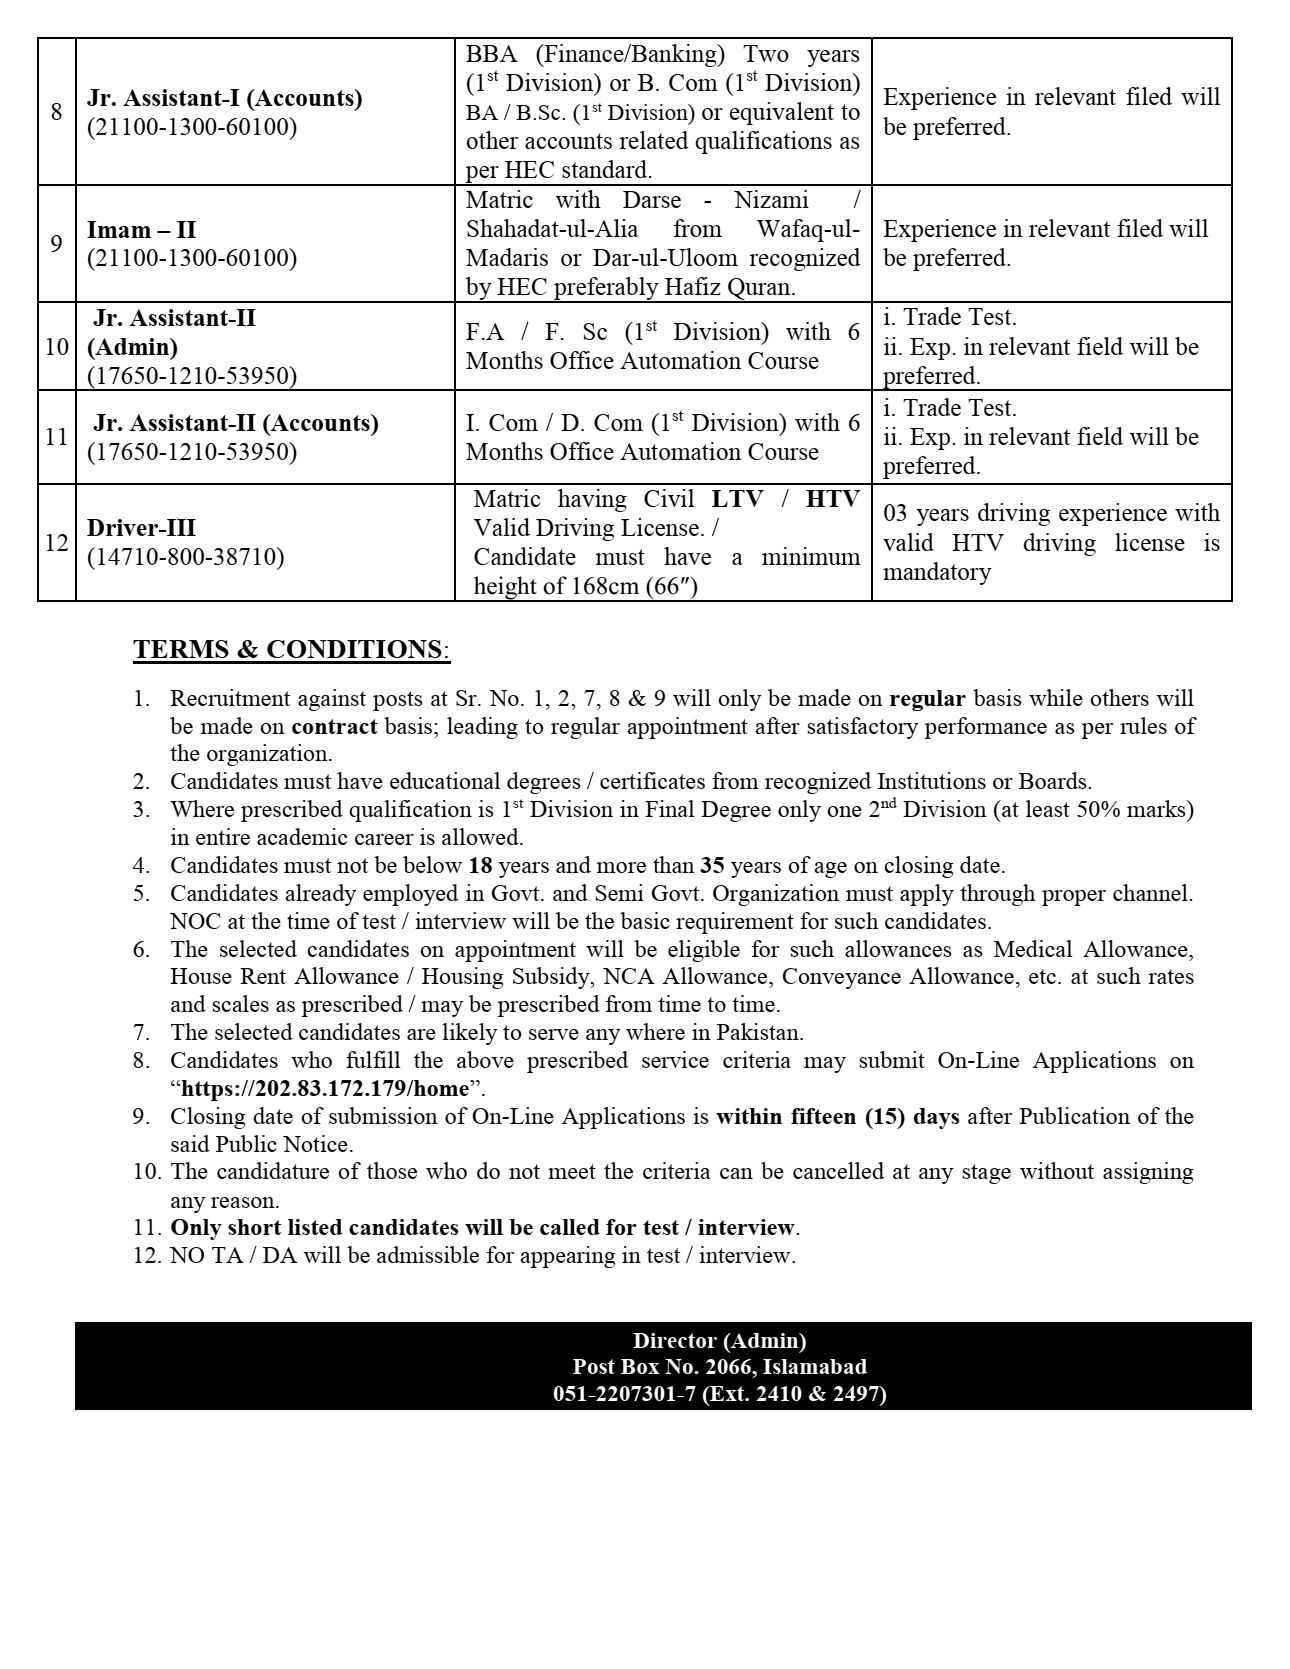 Pakistan Atomic Energy Commission PAEC Jobs 2021 | https://202.83.172.179/home